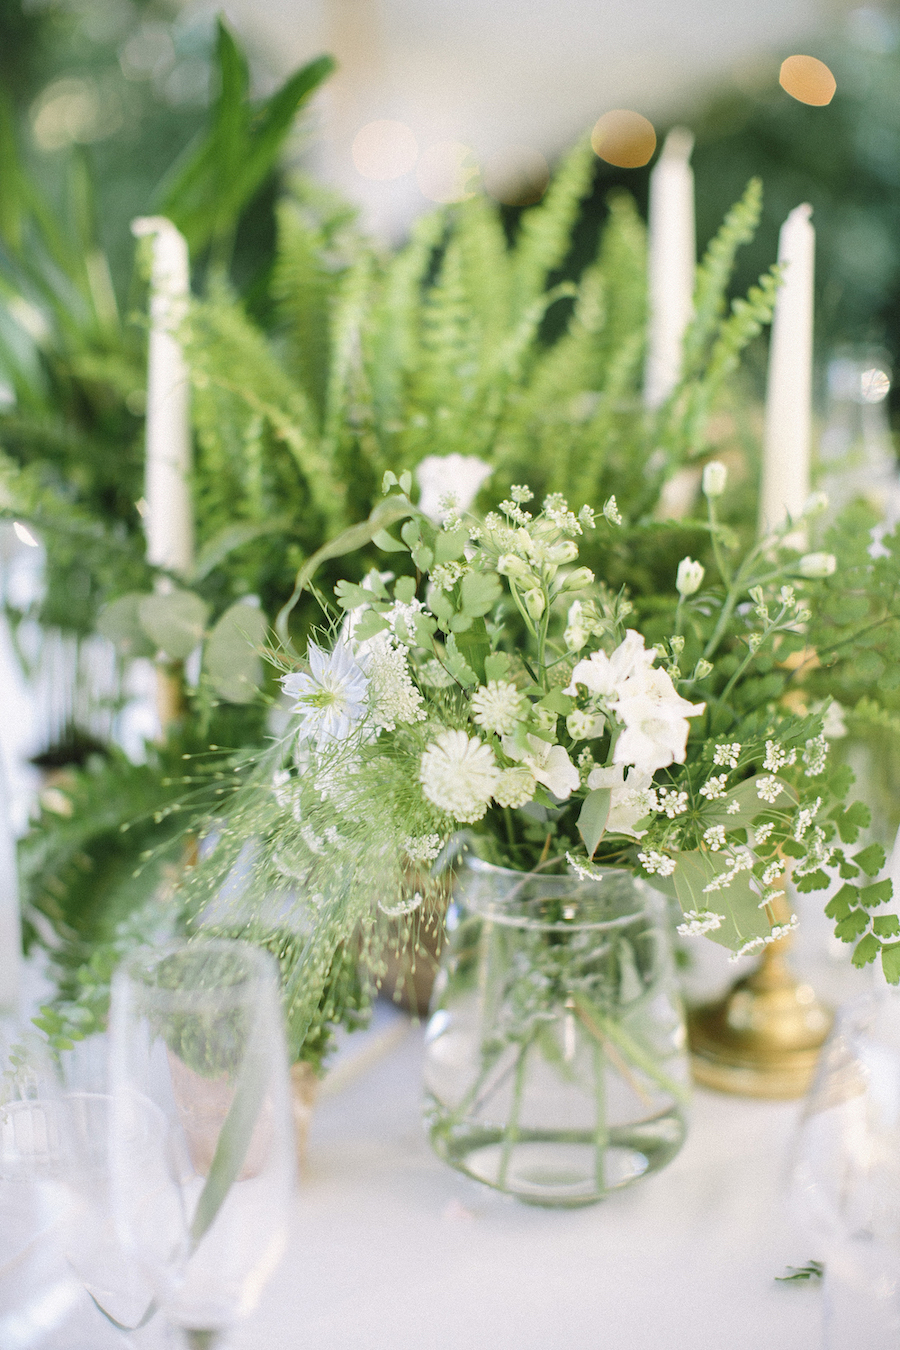 saya-photography-jewish-wedding-provence-rustic-lourmarin-le-galinier-42.jpg